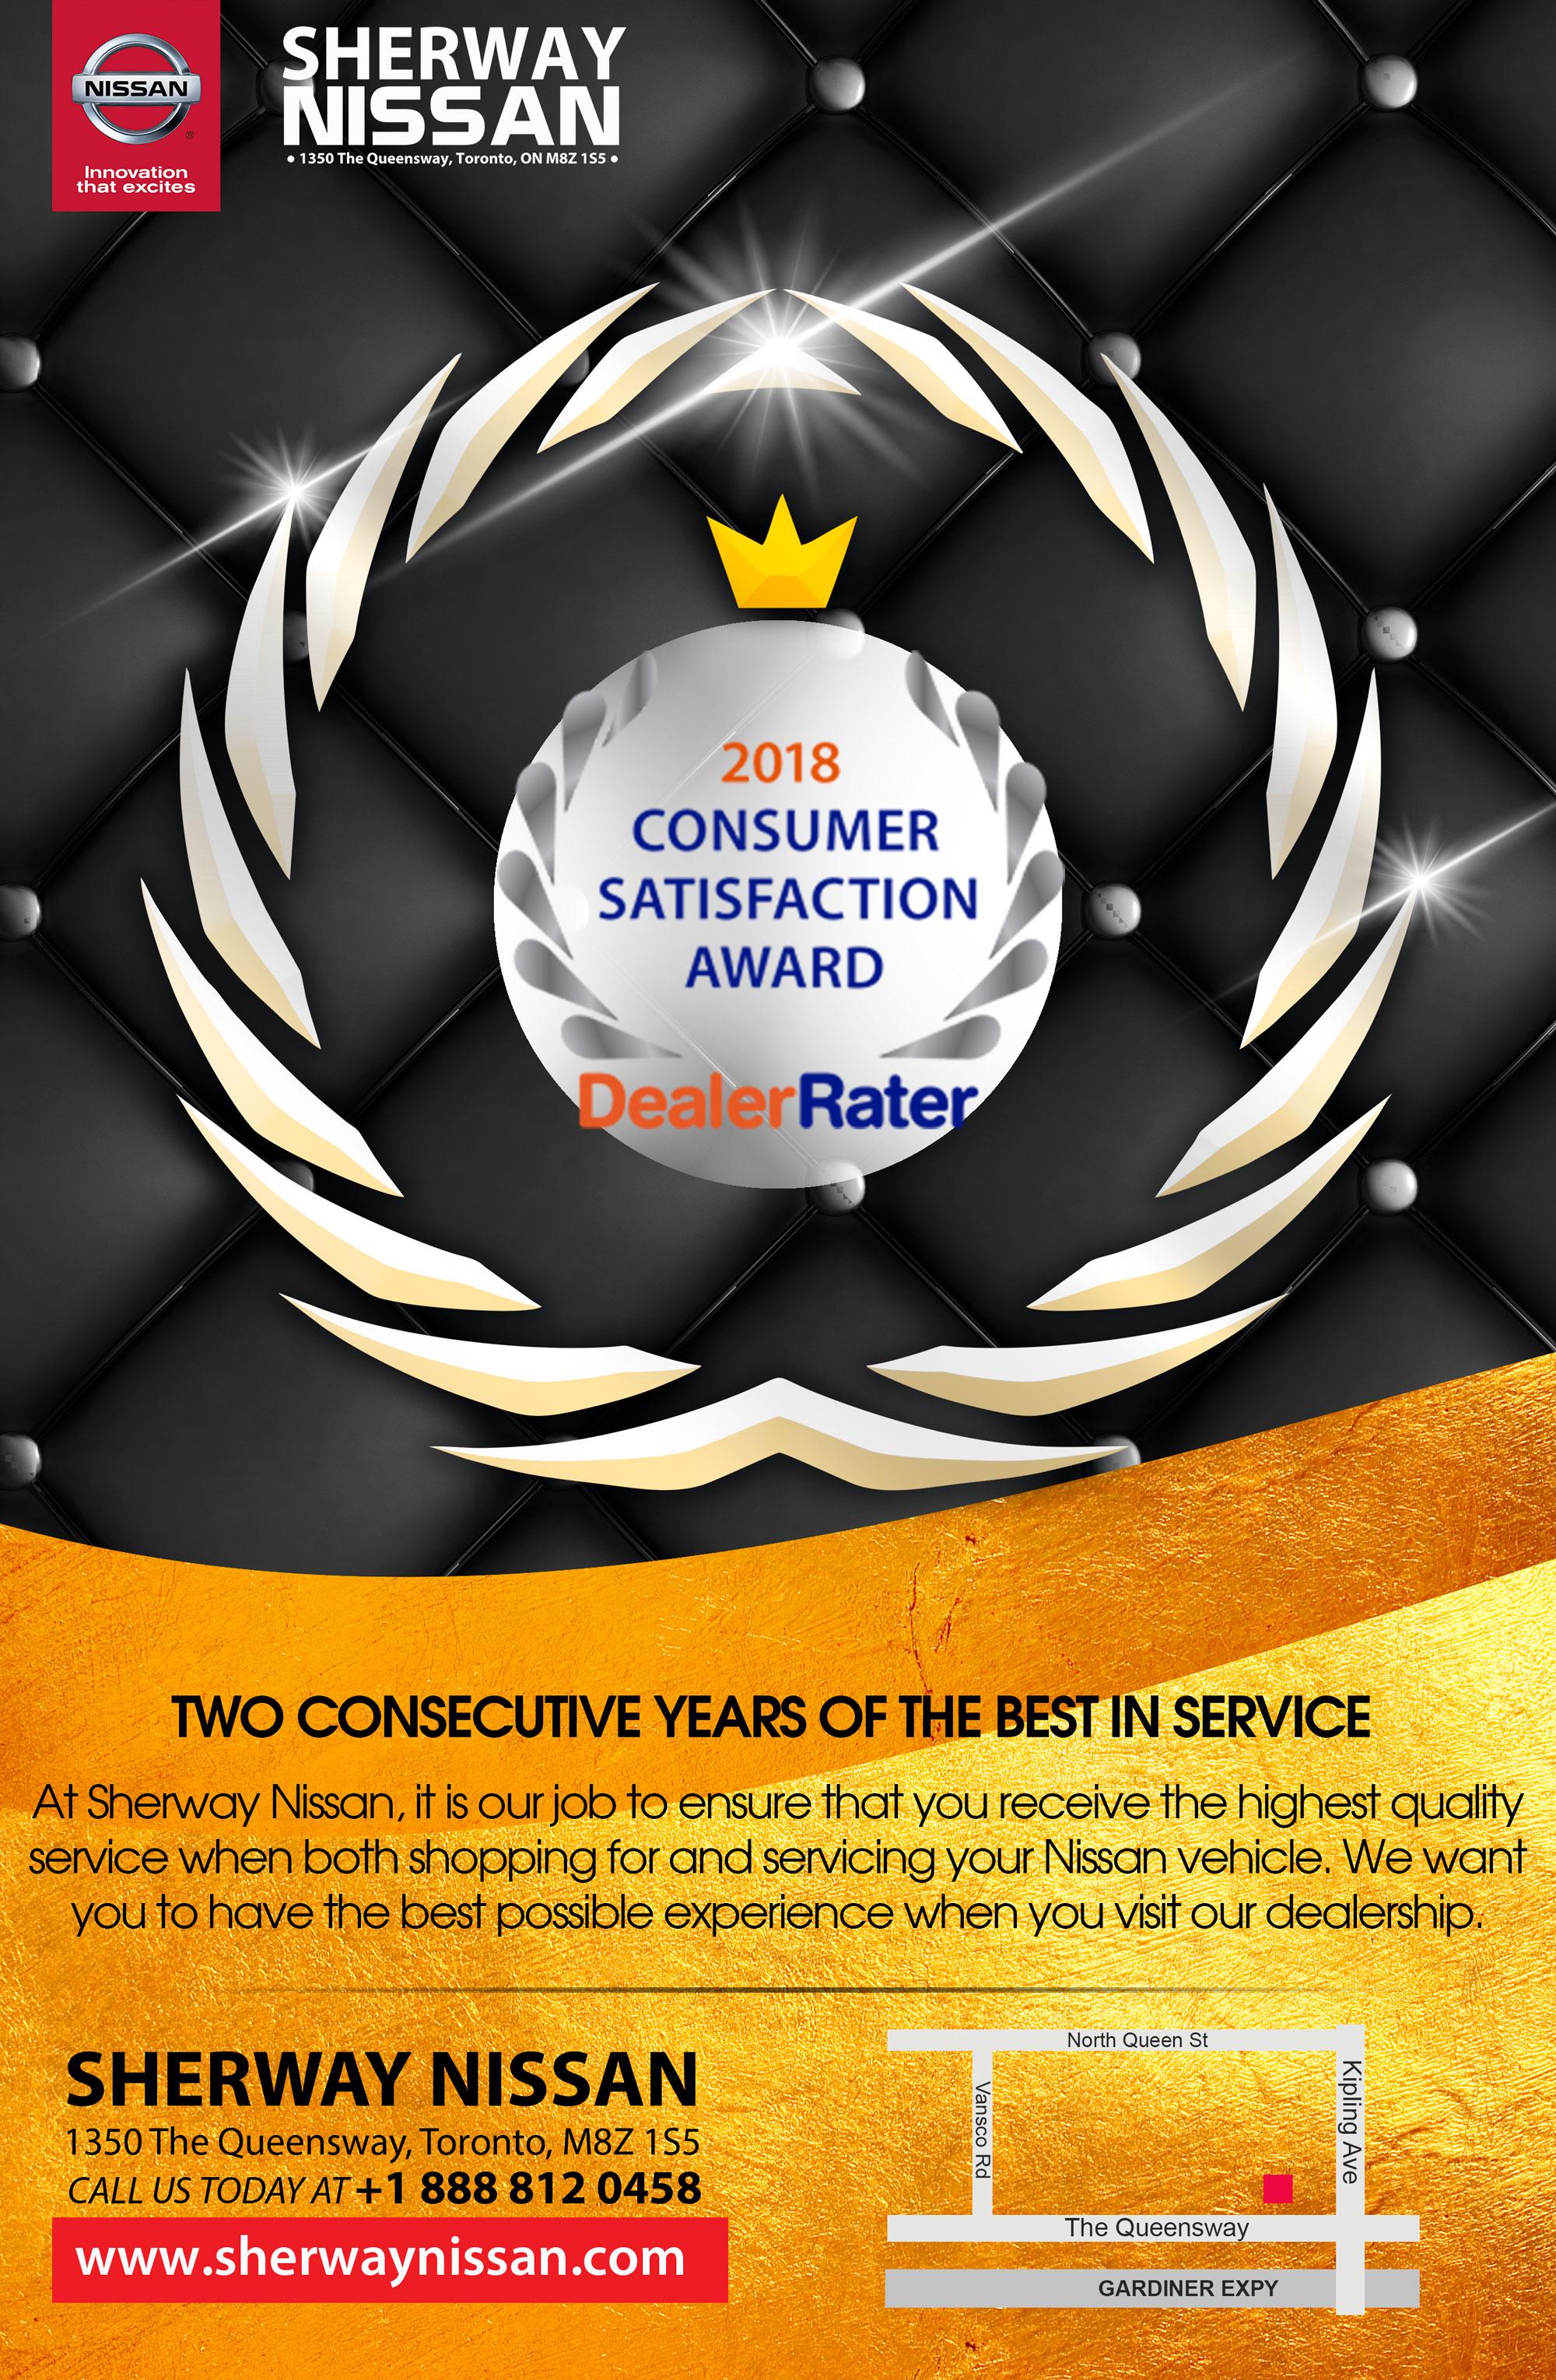 SherwayNissan-ConsumerAward-Poster